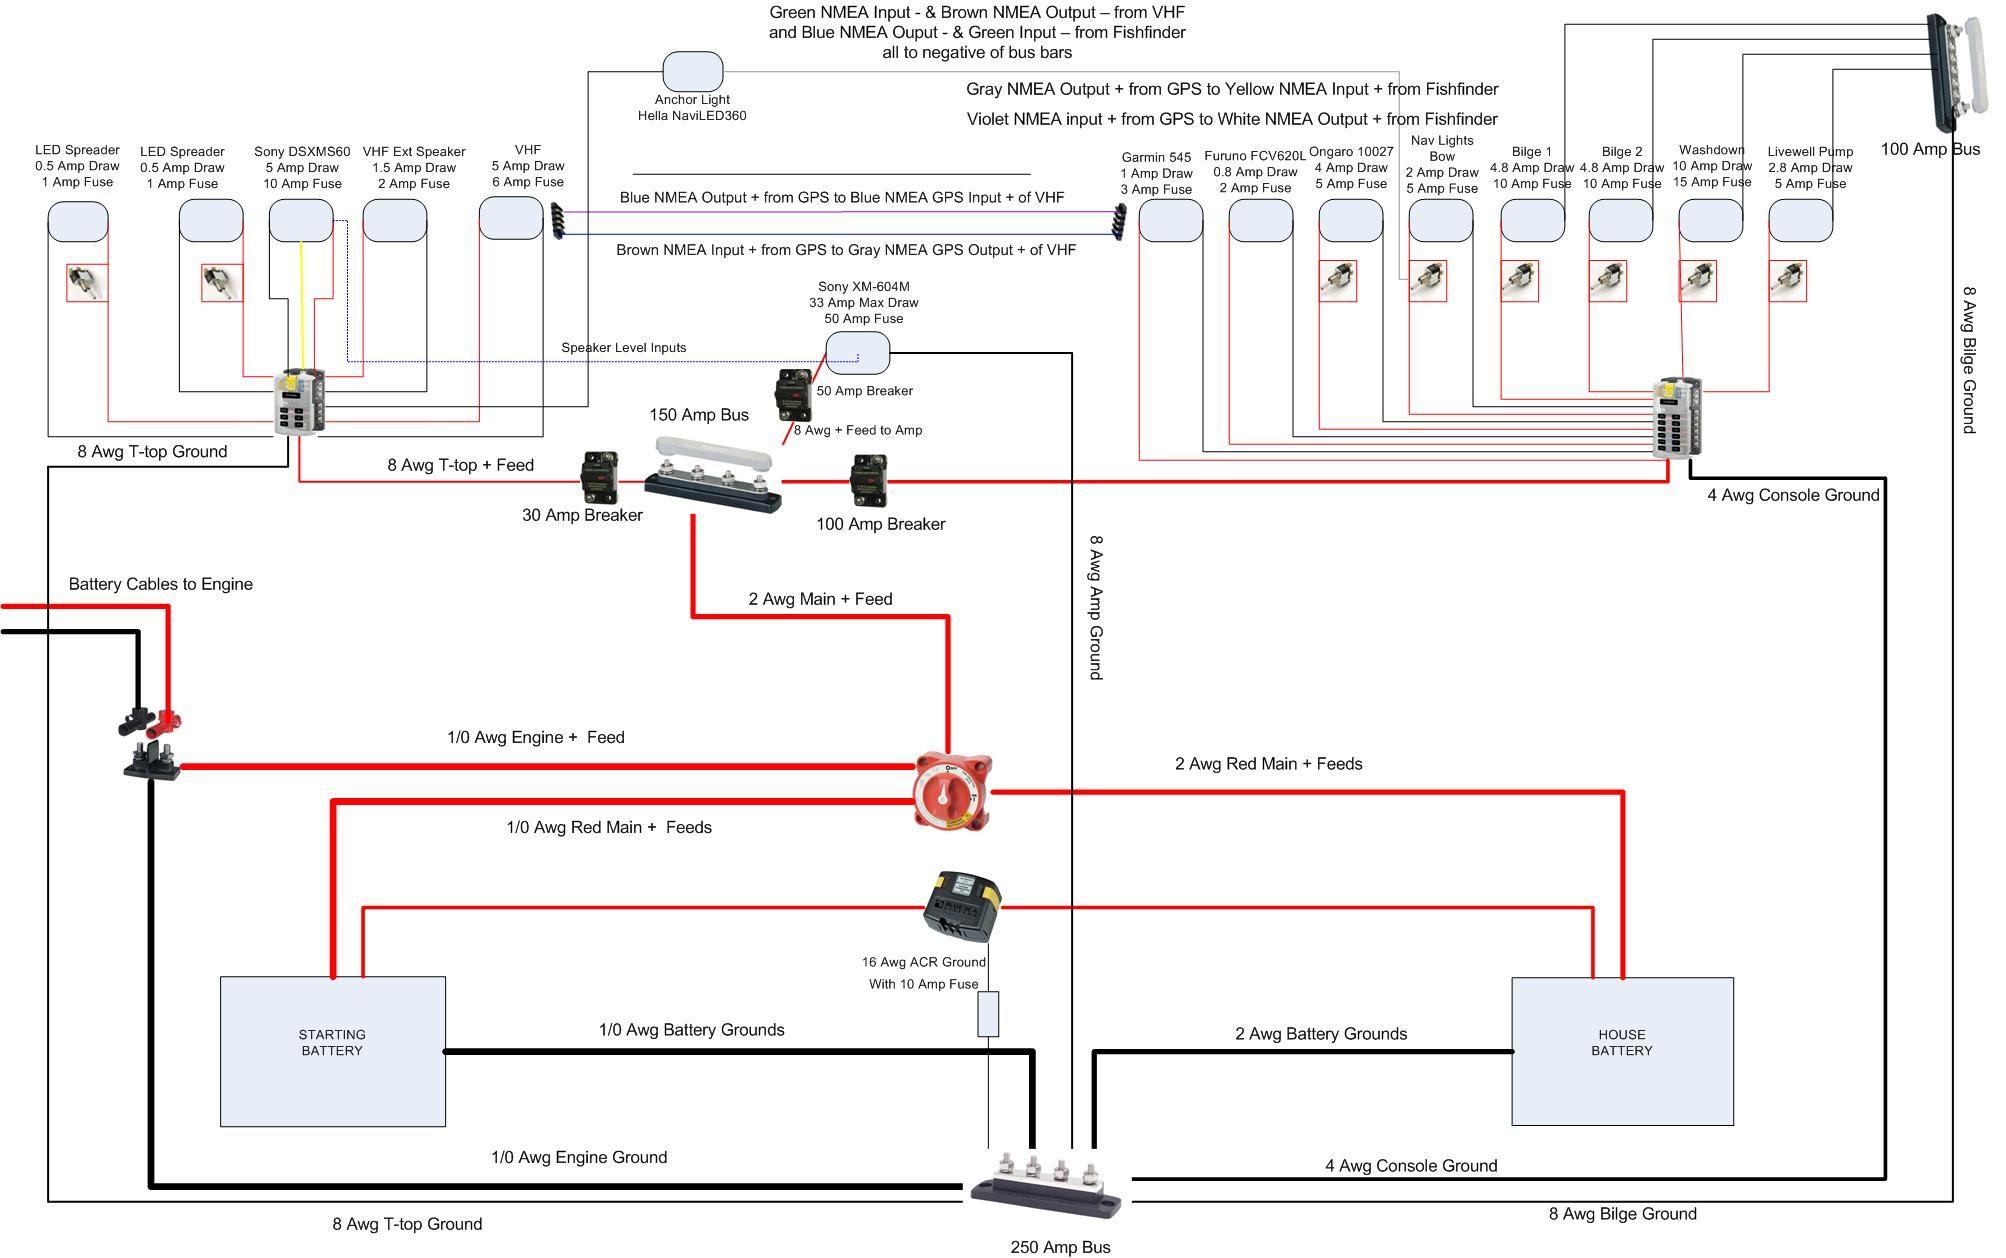 Swell Drag Boat Wiring Diagram Basic Electronics Wiring Diagram Wiring Cloud Timewinrebemohammedshrineorg